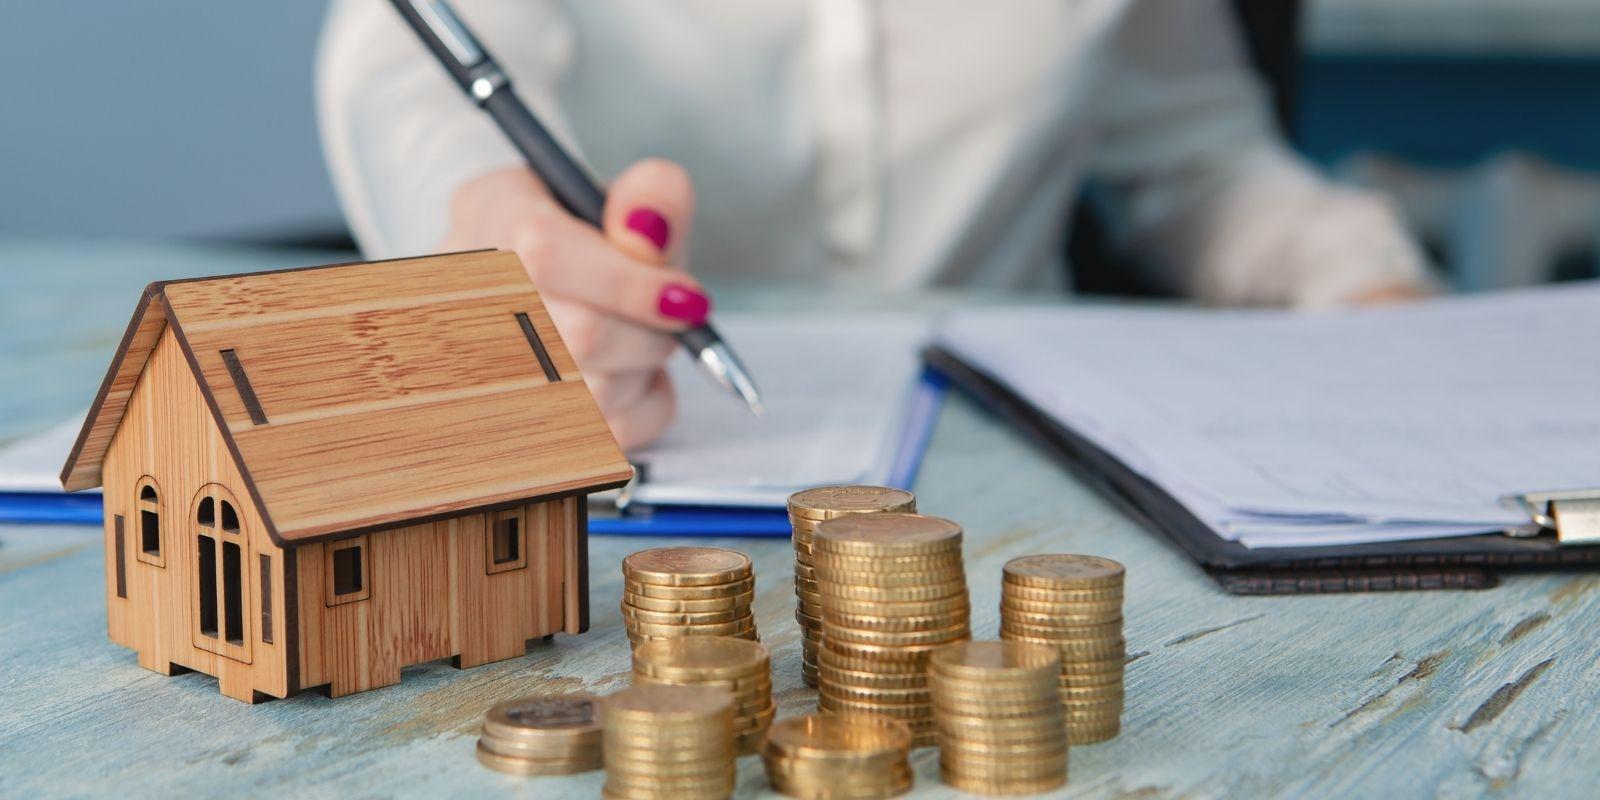 8. Factor in Homeowner Costs